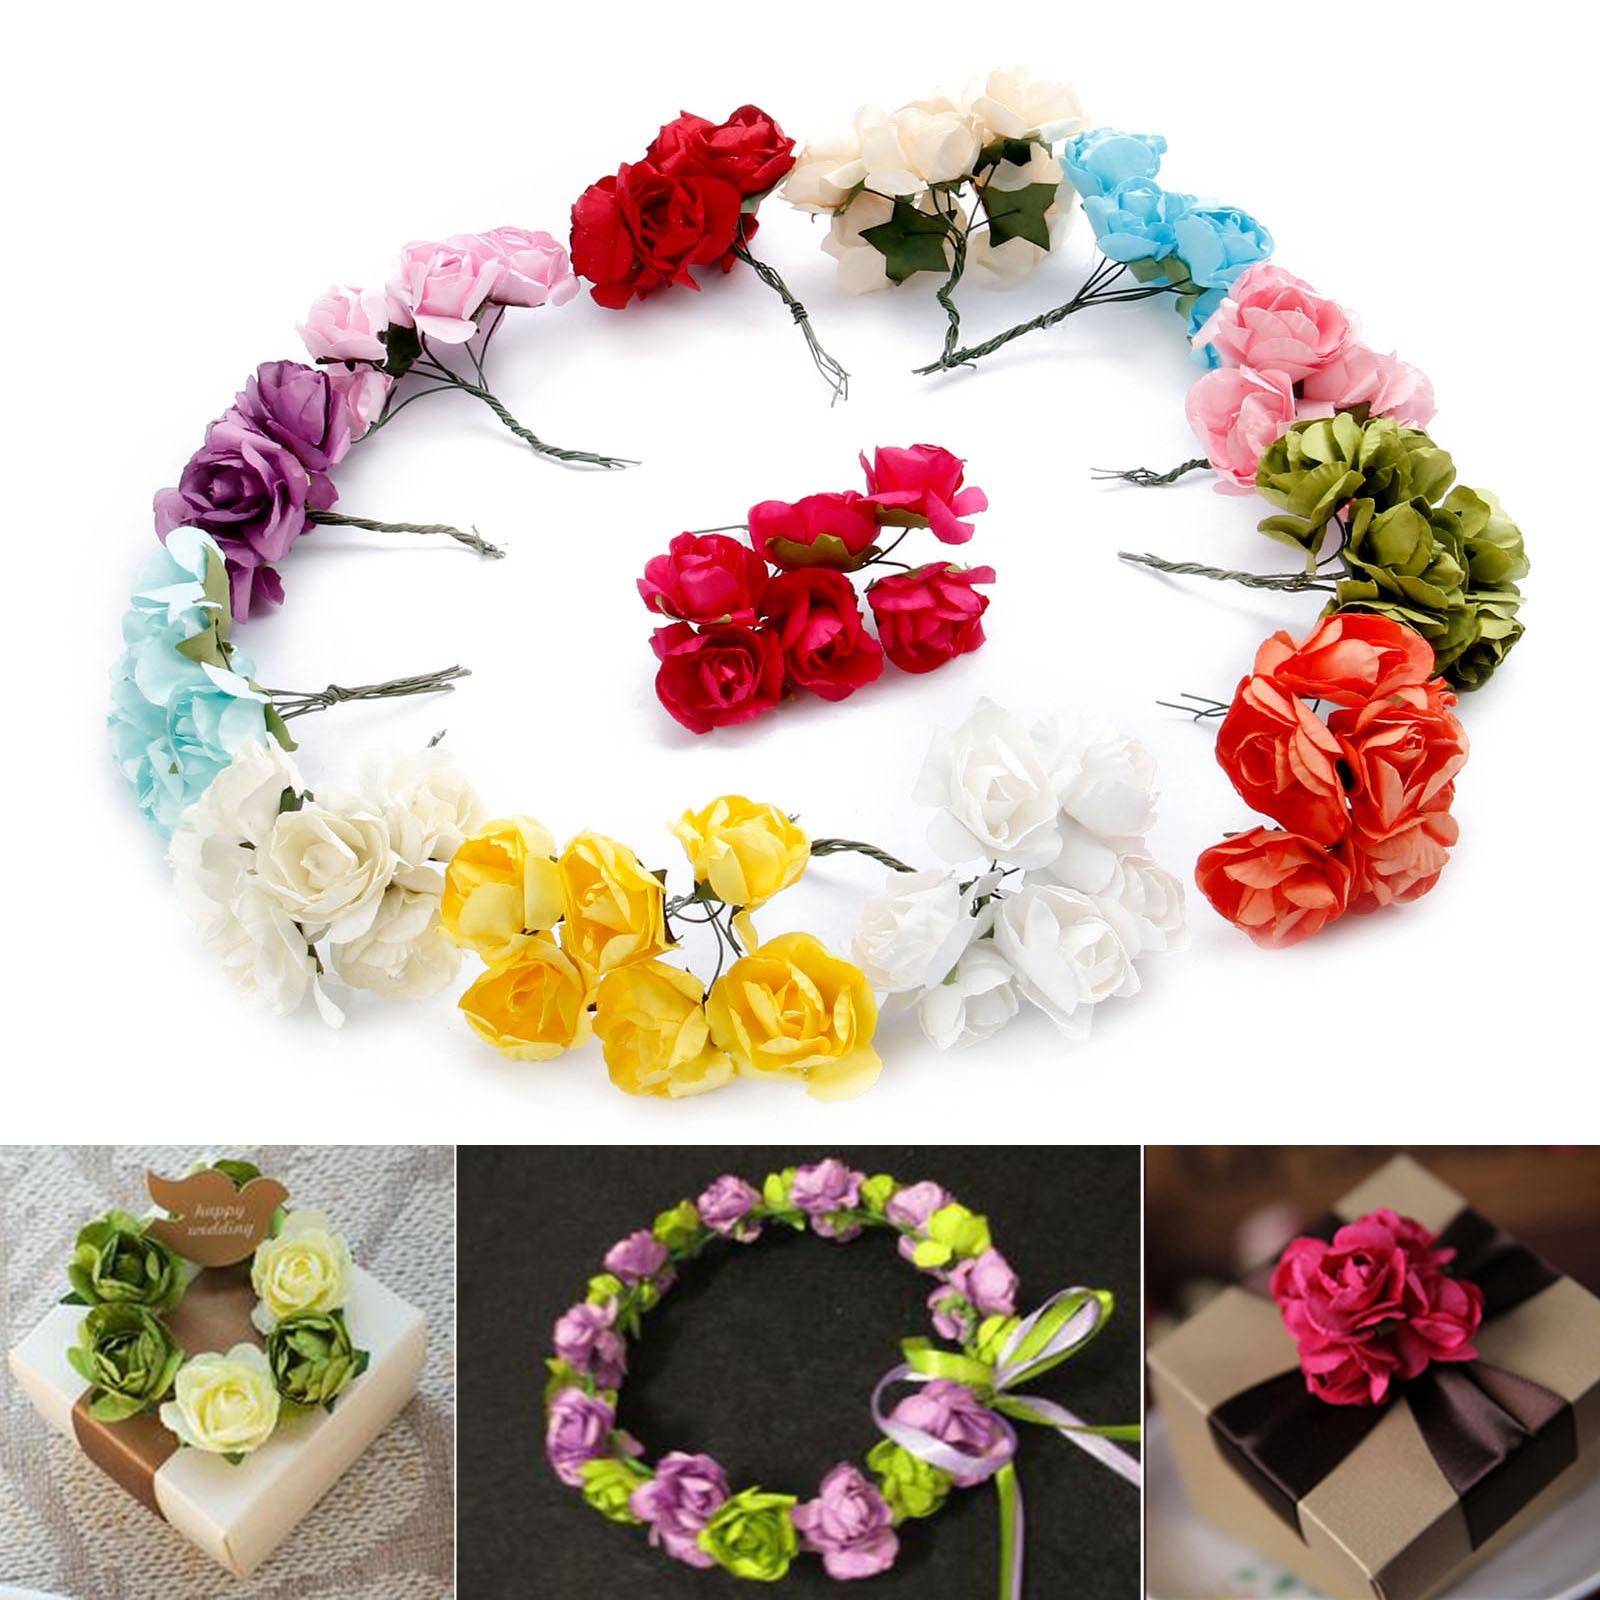 Home & Garden Realistic 24pcs 2.5cm Cheap Artificial Mini Paper Flowers Head Diy Wedding Room Wedding Car Decoration Simulation Flower Ball